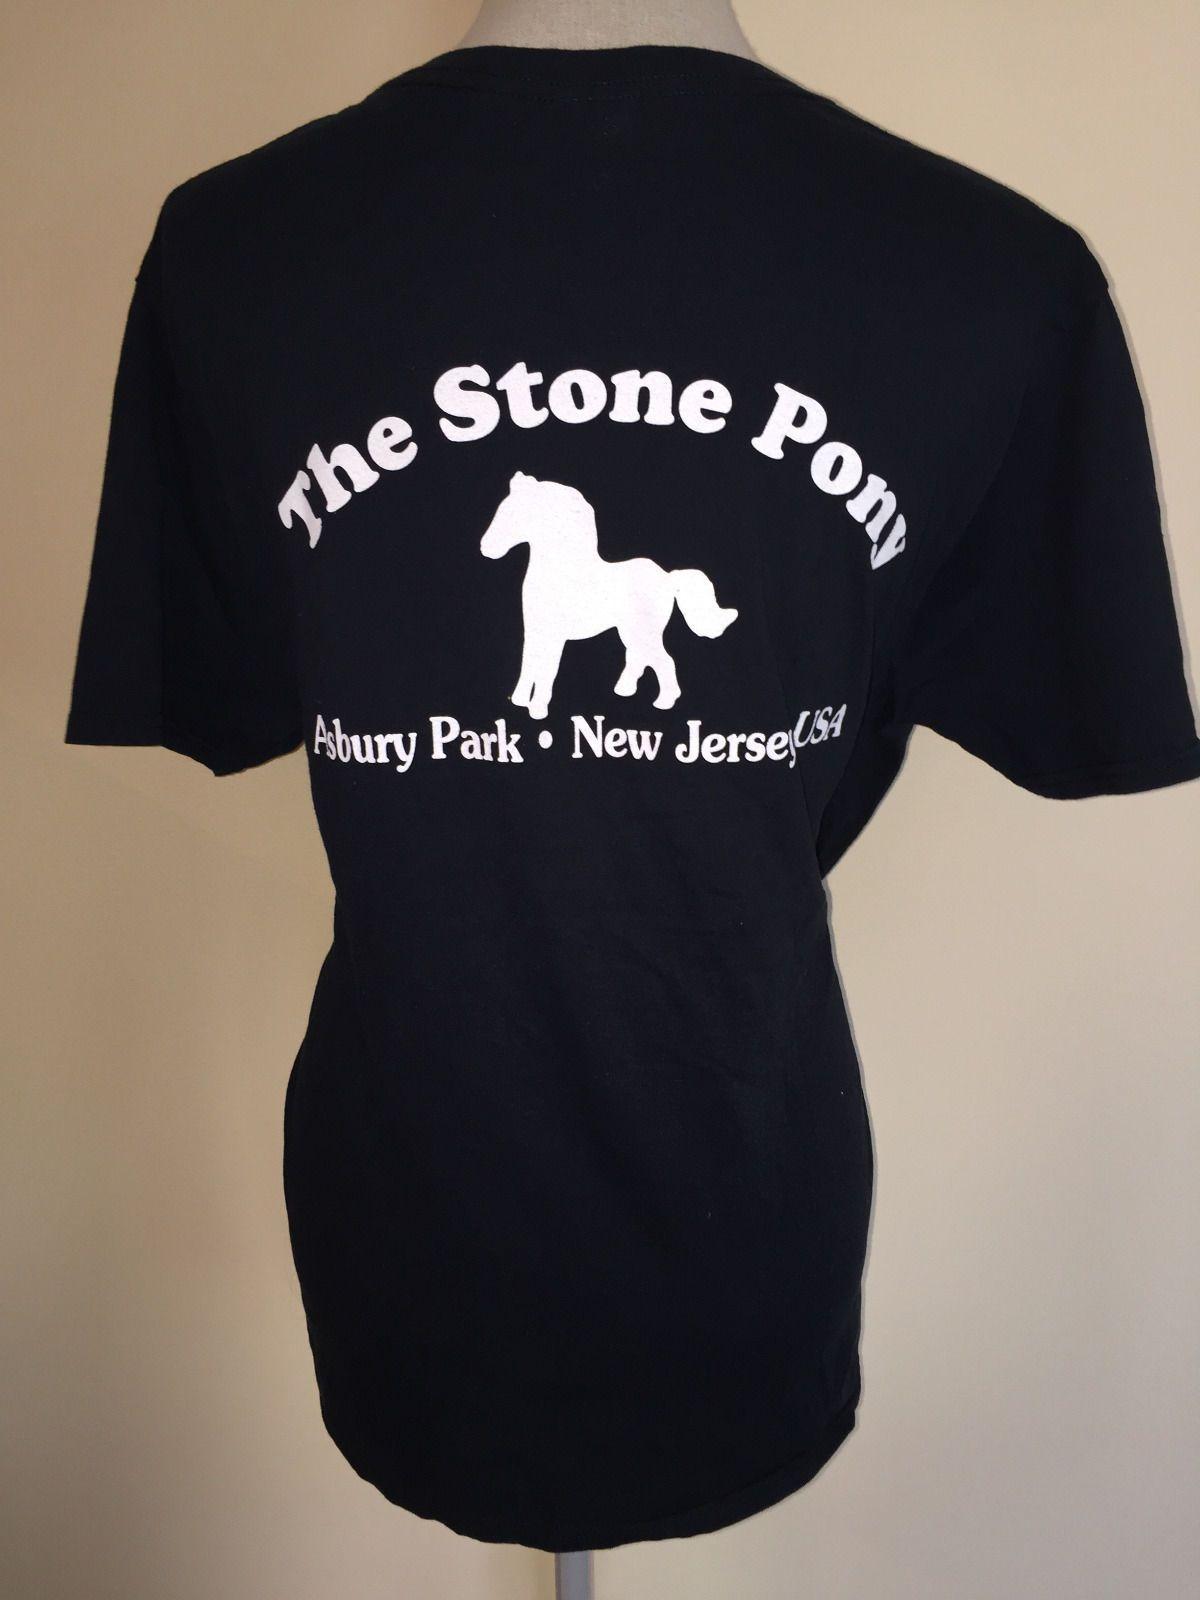 0bd5439c8021 *SOLD* Vintage 90s The Stone Pony Bar T-Shirt Concert Venue Asbury Park NJ  USA | #stonepony #newjersey #nj #asberypark